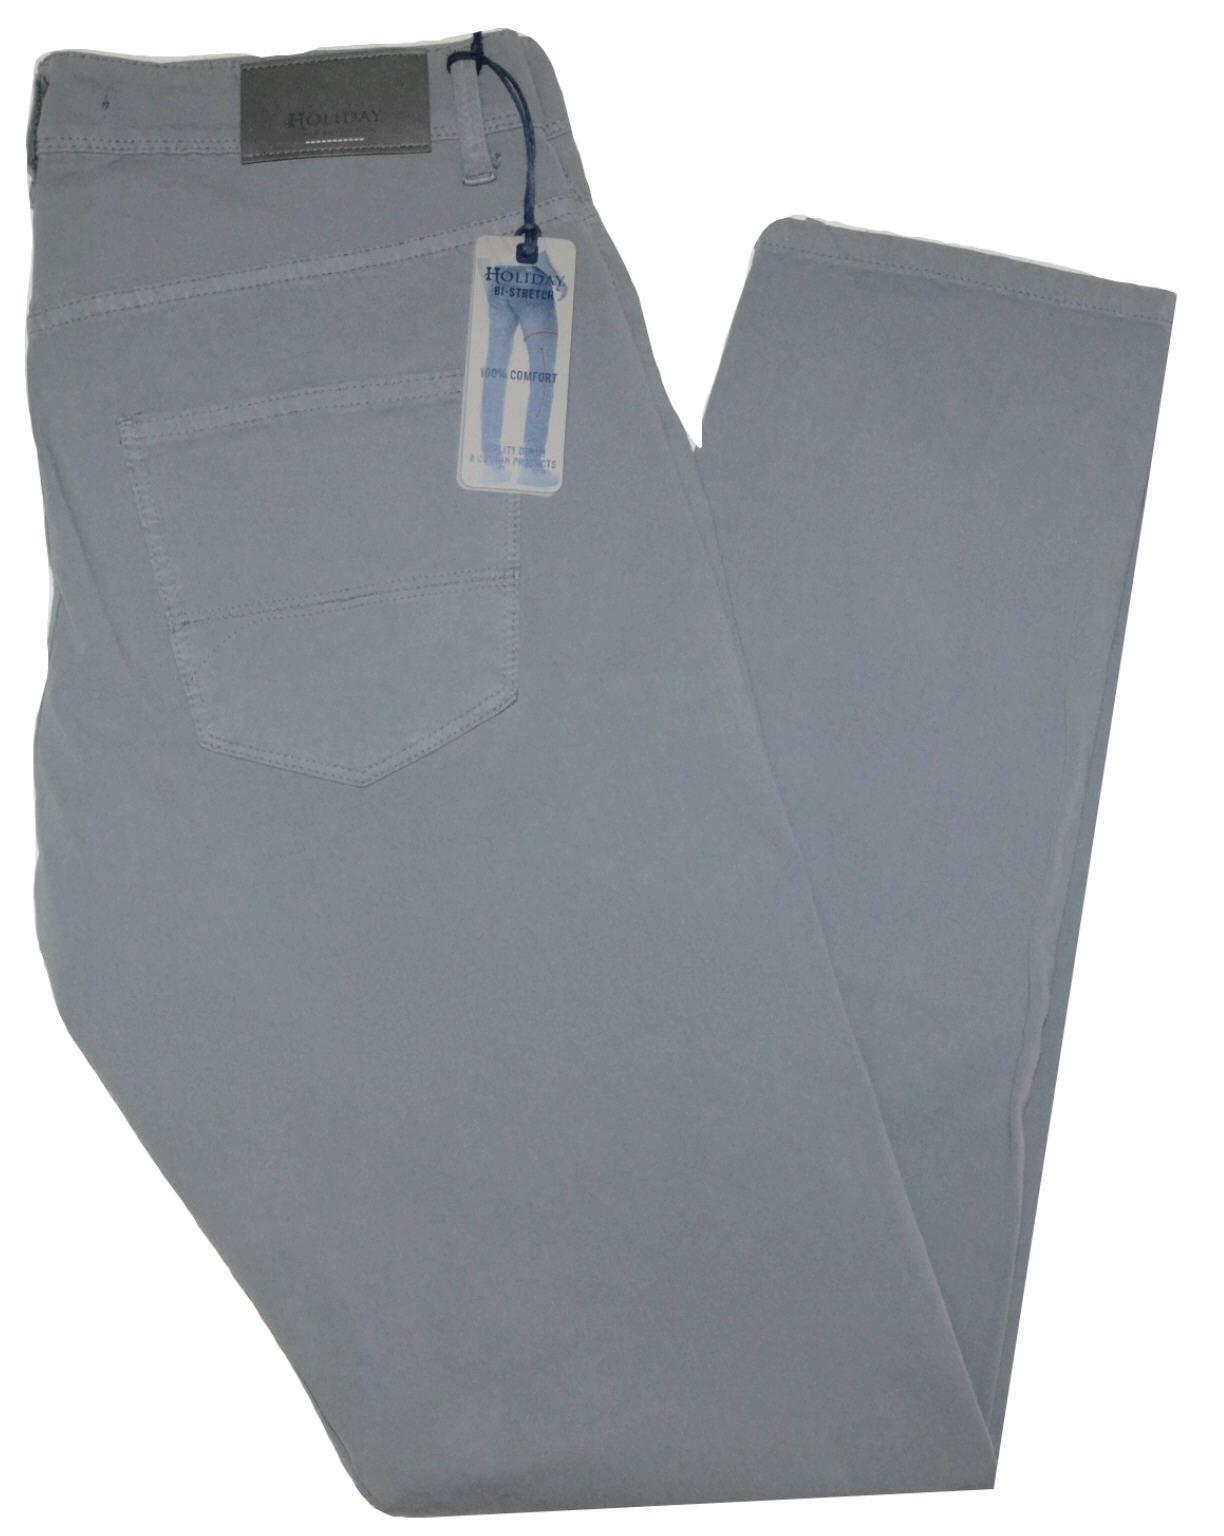 Men's trousers HOLIDAY slim 46 48 50 52 54 56 58 60 cotton bielastic SIPI grey